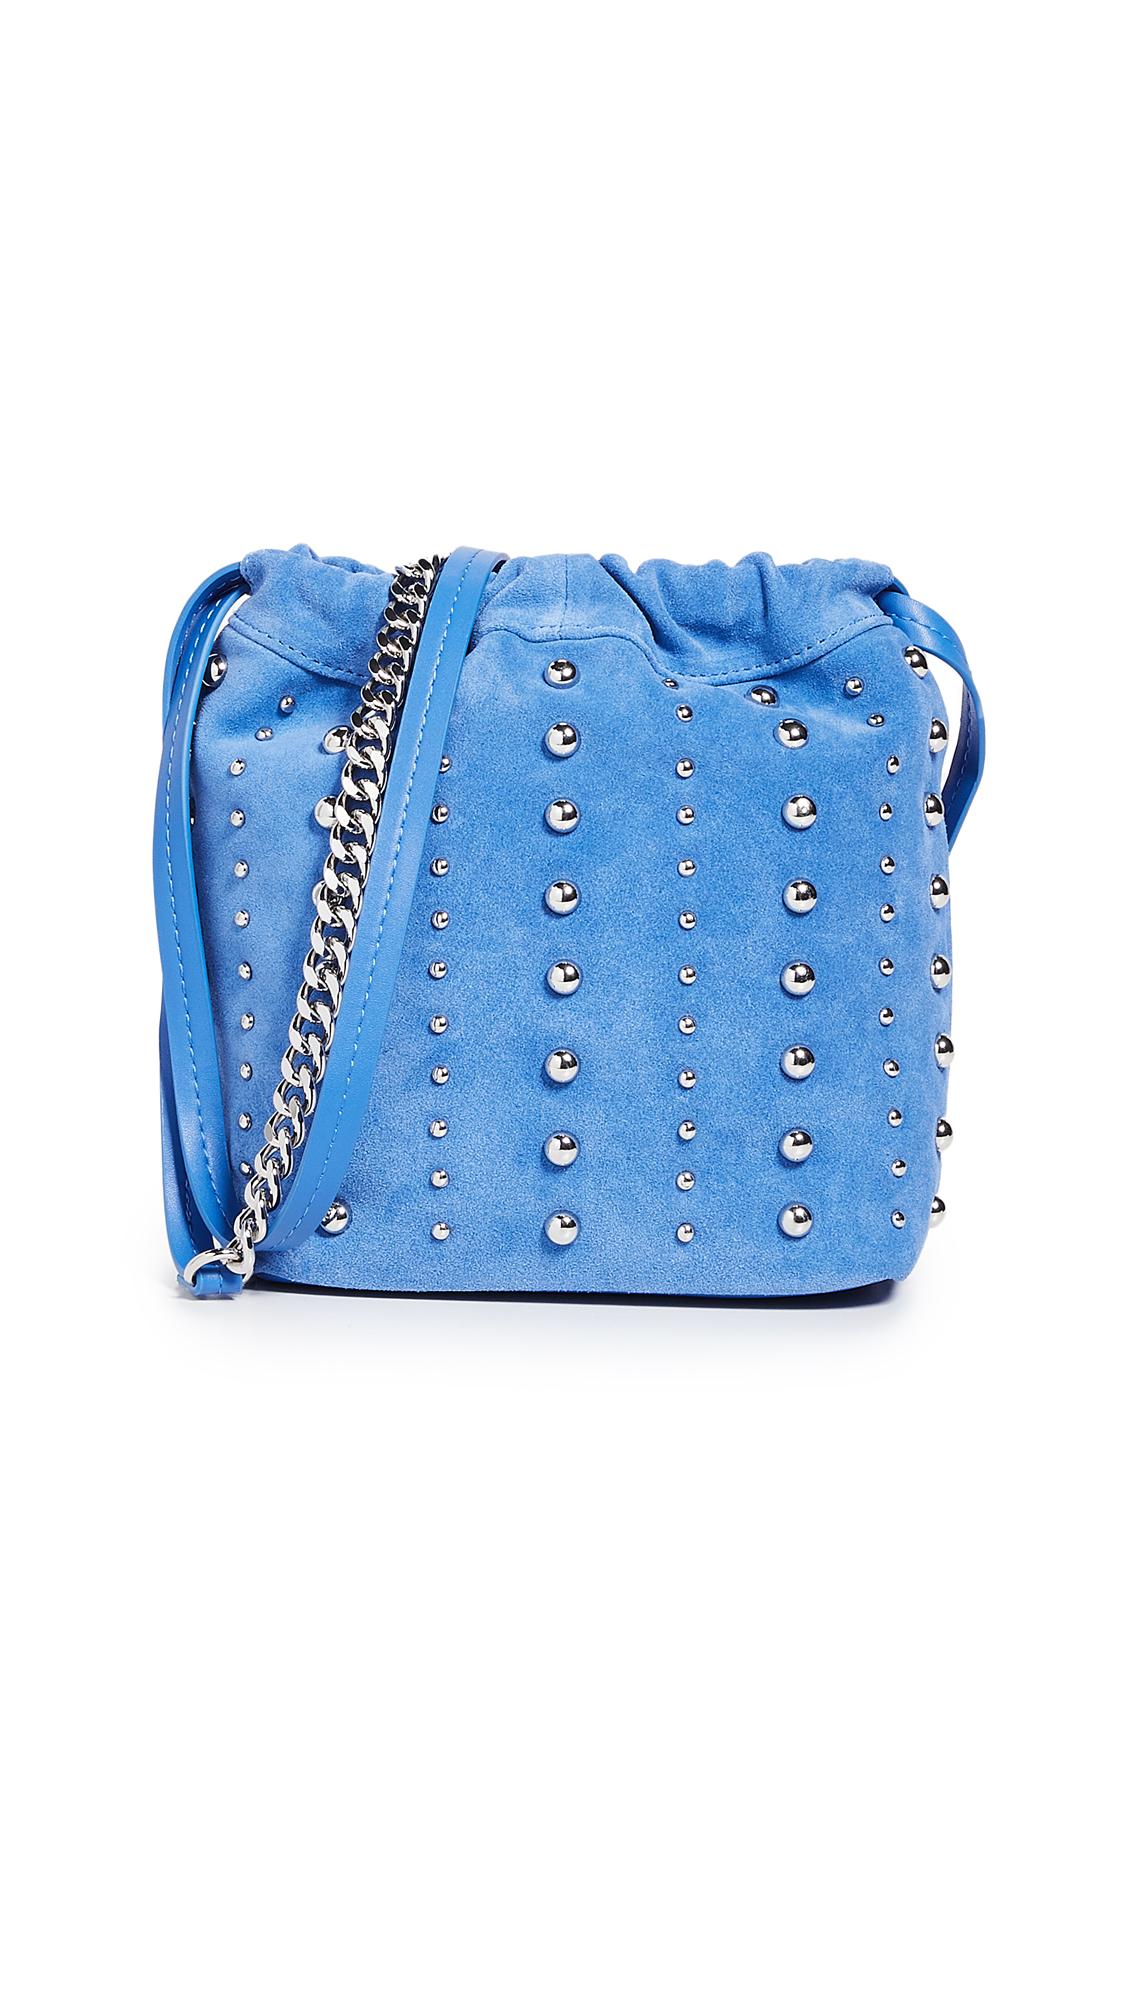 Sam Edelman Saville Mini Cinch Crossbody Bag - Horizon Blue